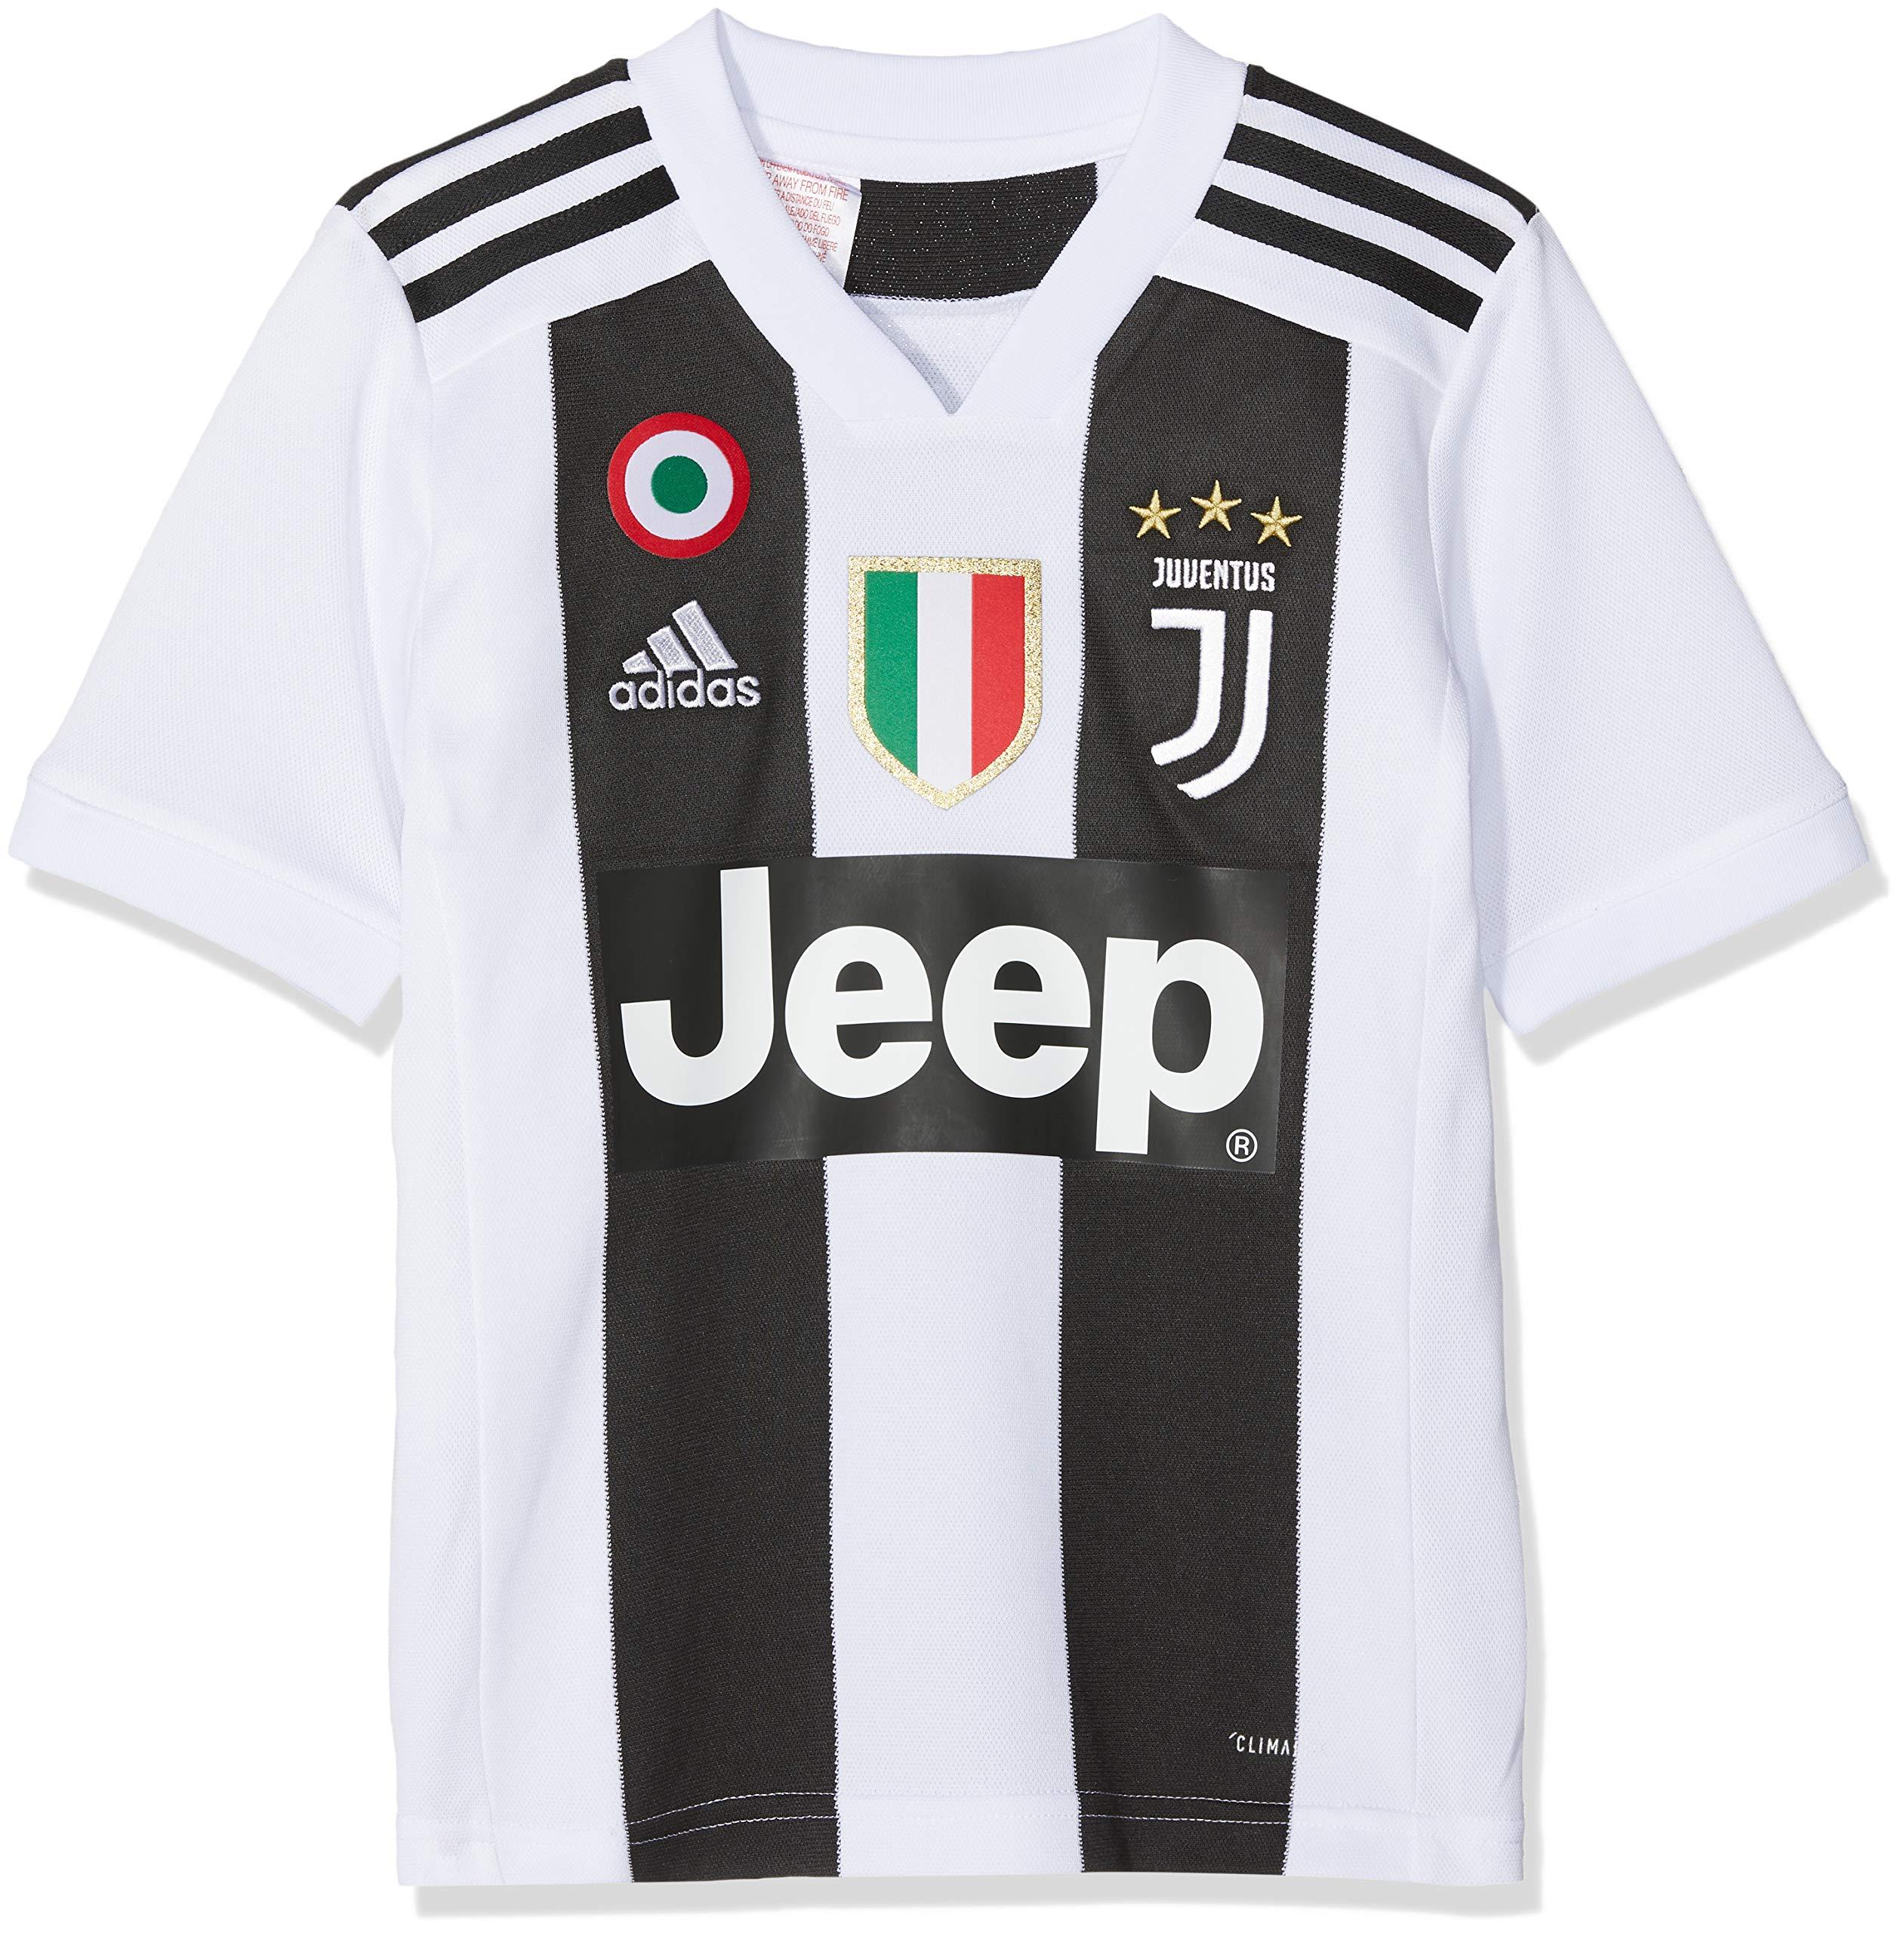 adidas Juve H JSY Y, Maglia Gara Home 2018/2019 Cristiano Ronaldo, Bambino 1 spesavip